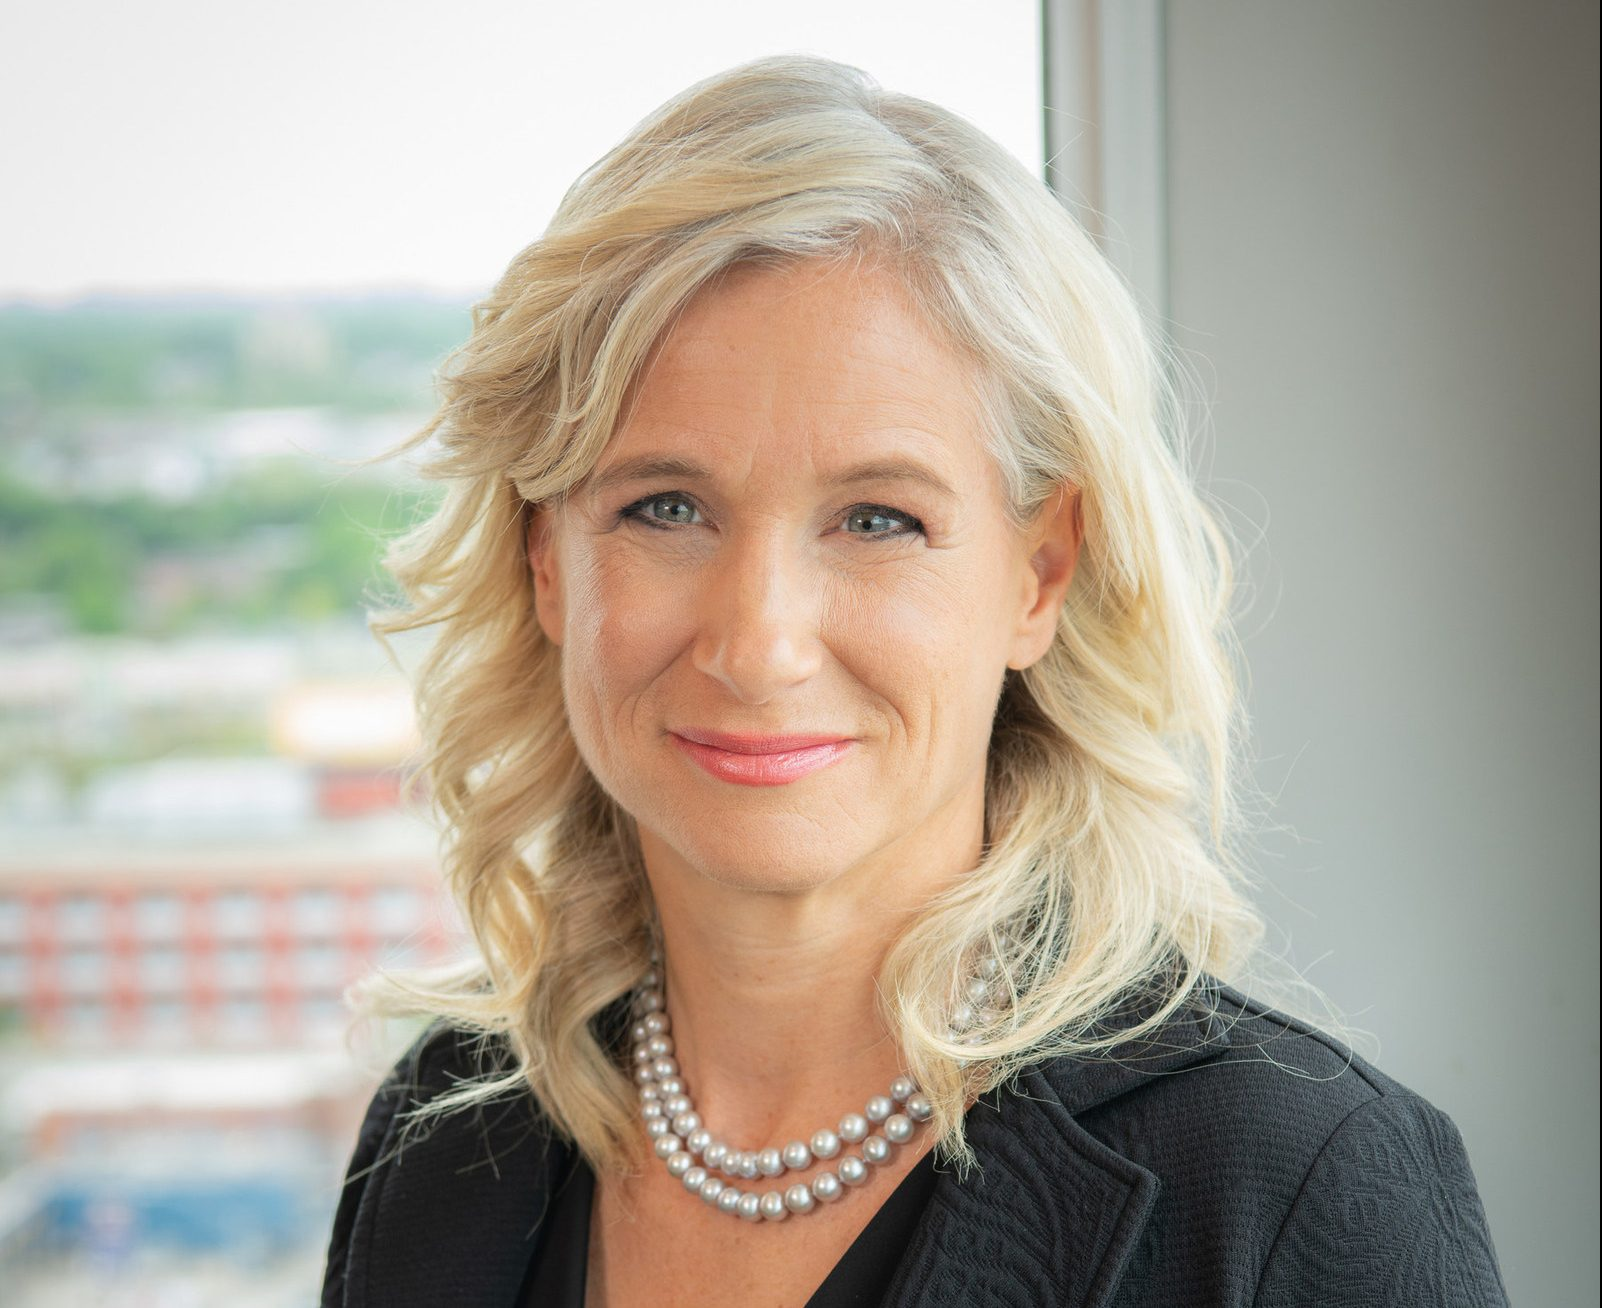 Janie Béïque named Executive Vice-President for Investments at the Fonds de solidarité FTQ (CNW Group/Fonds de solidarité FTQ)